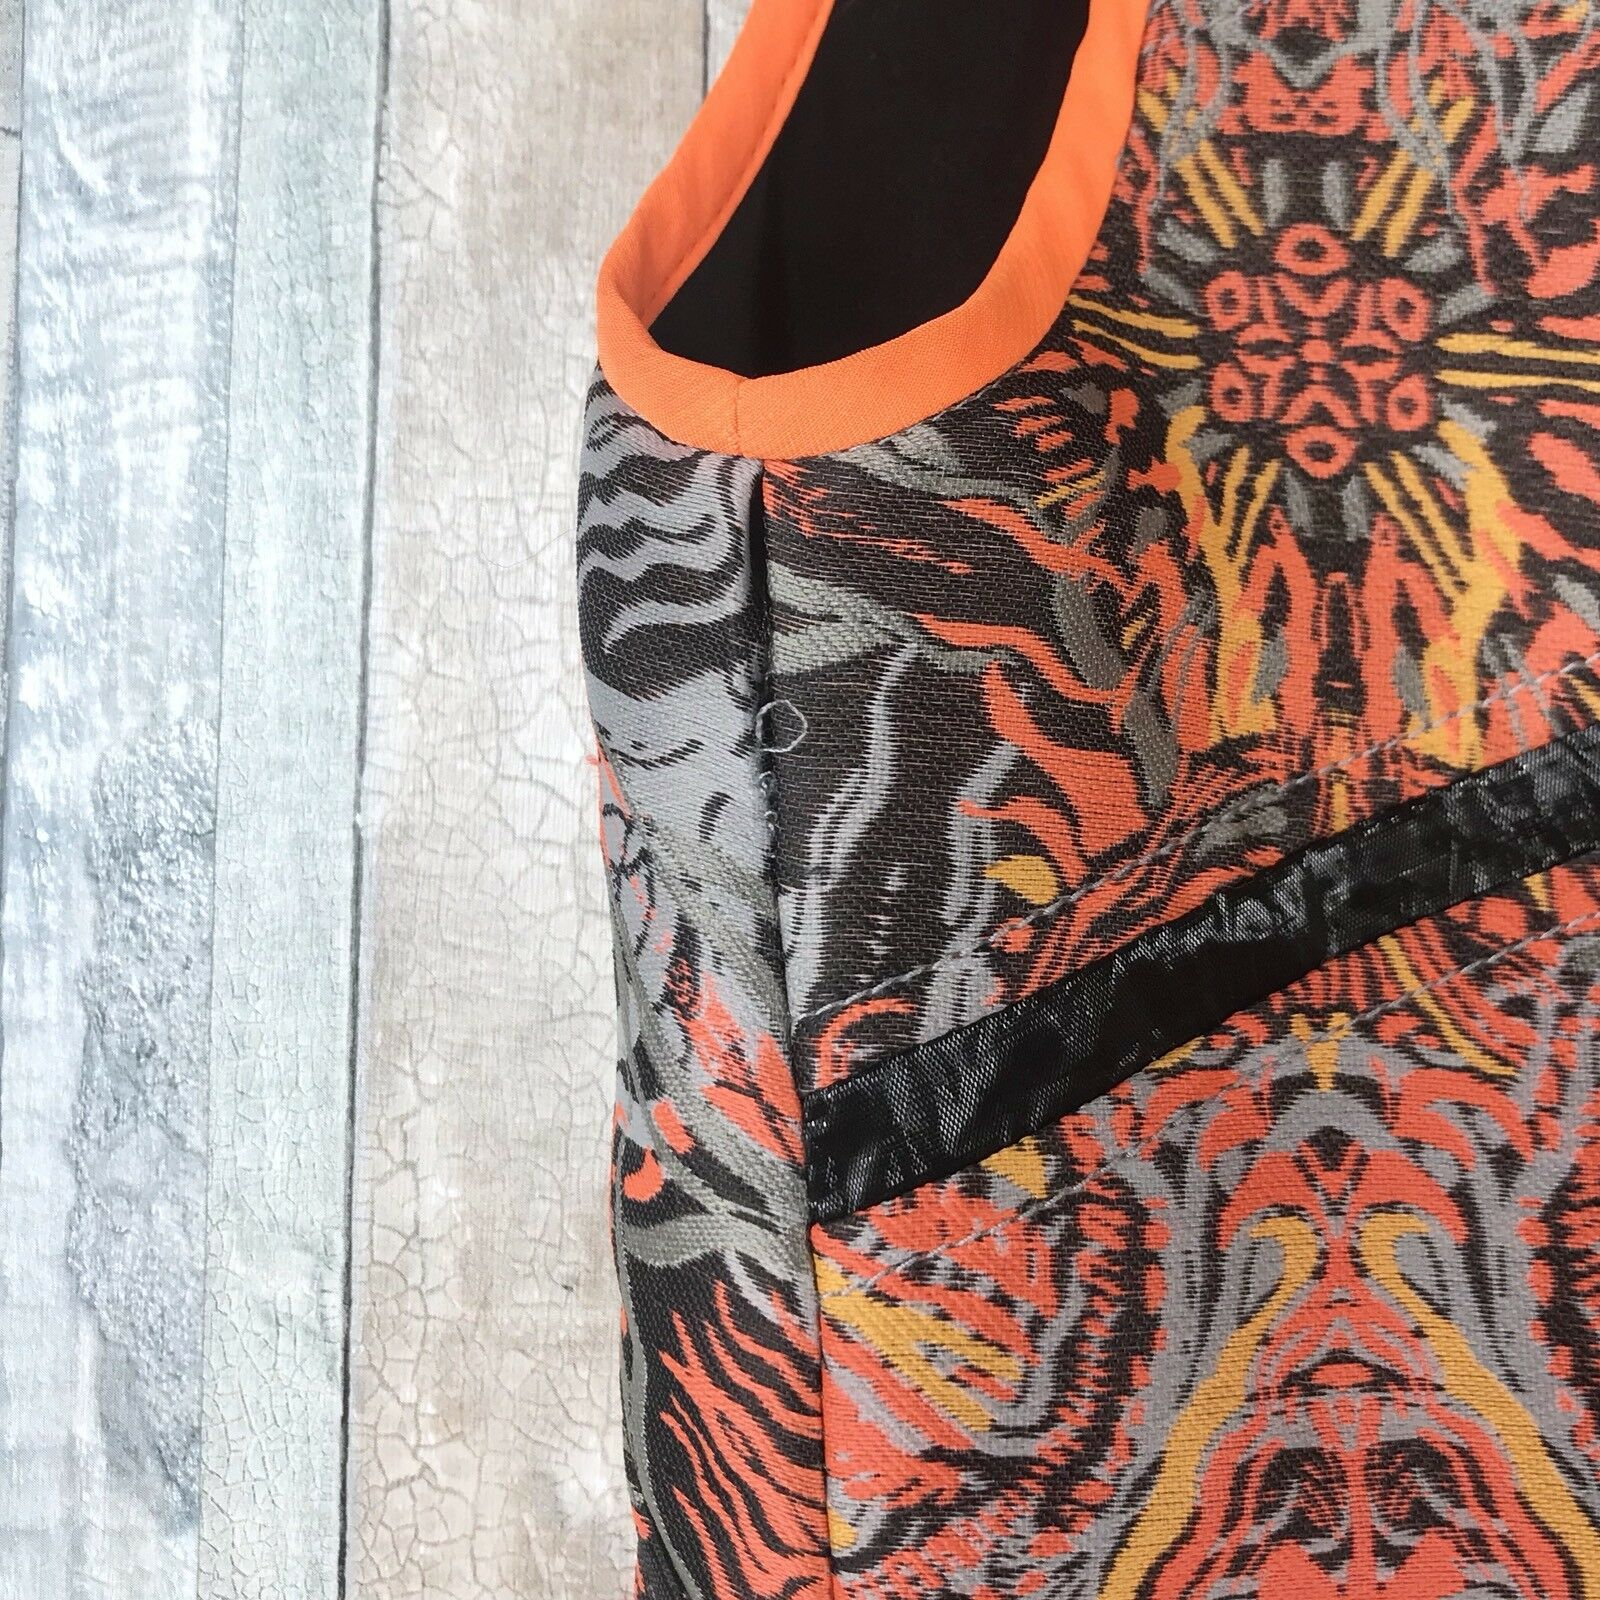 Helmut Helmut Helmut Lang 0 Asymmetric Neon orange Floral Medallion Jacquard Dress Runway  815 95c117